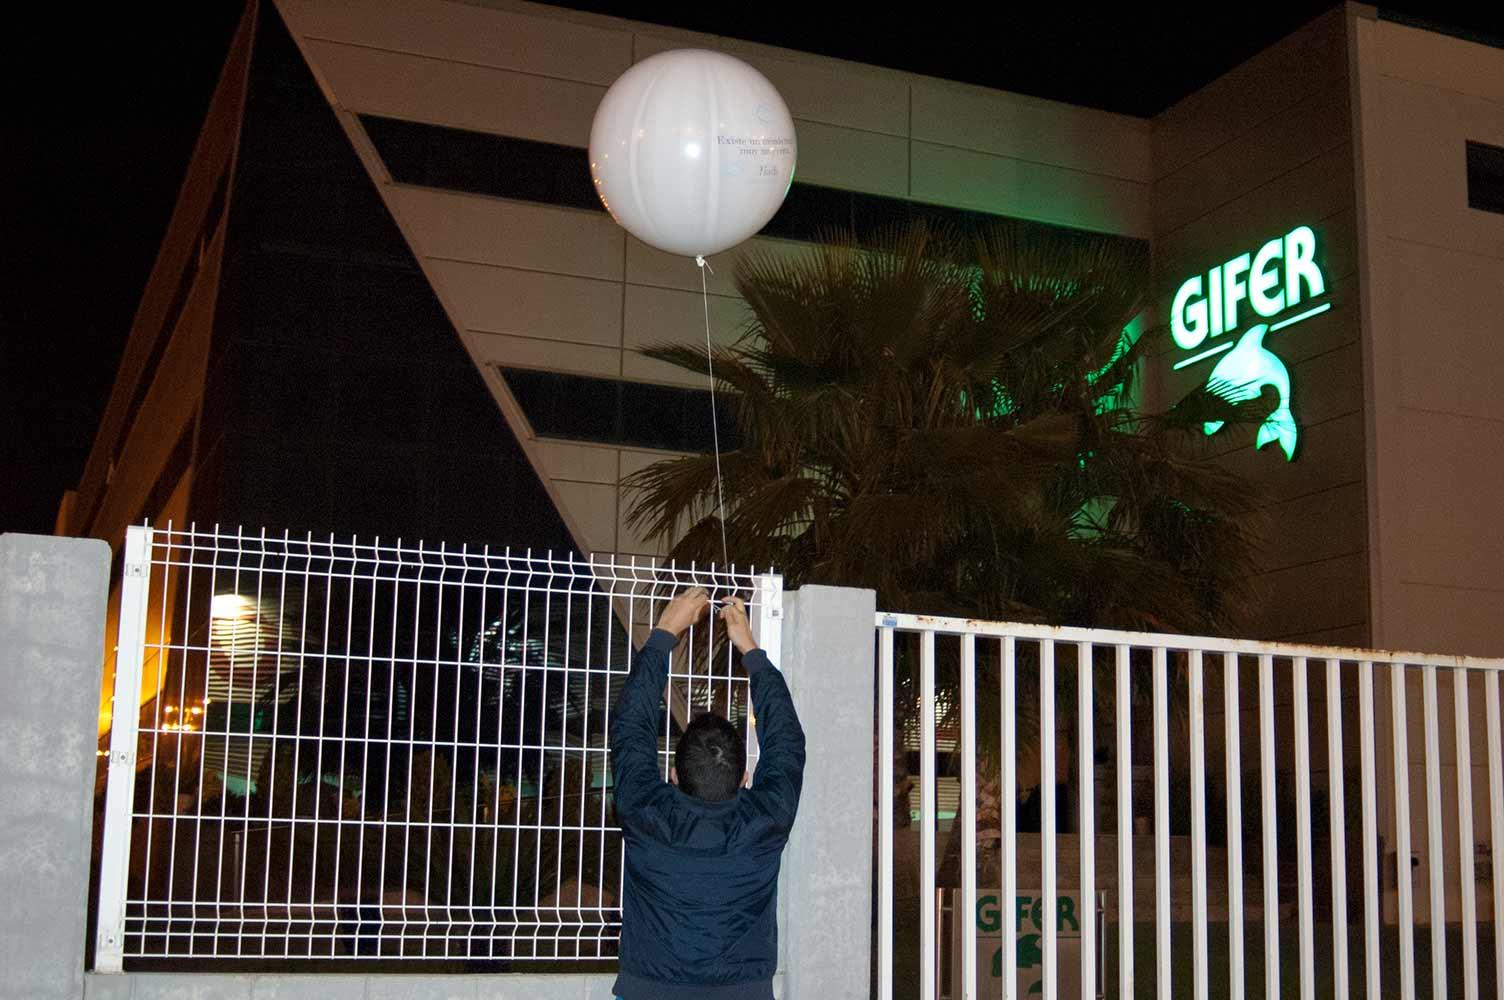 Instalación nocturna de globos de Helio gigantes en acceso a empresas